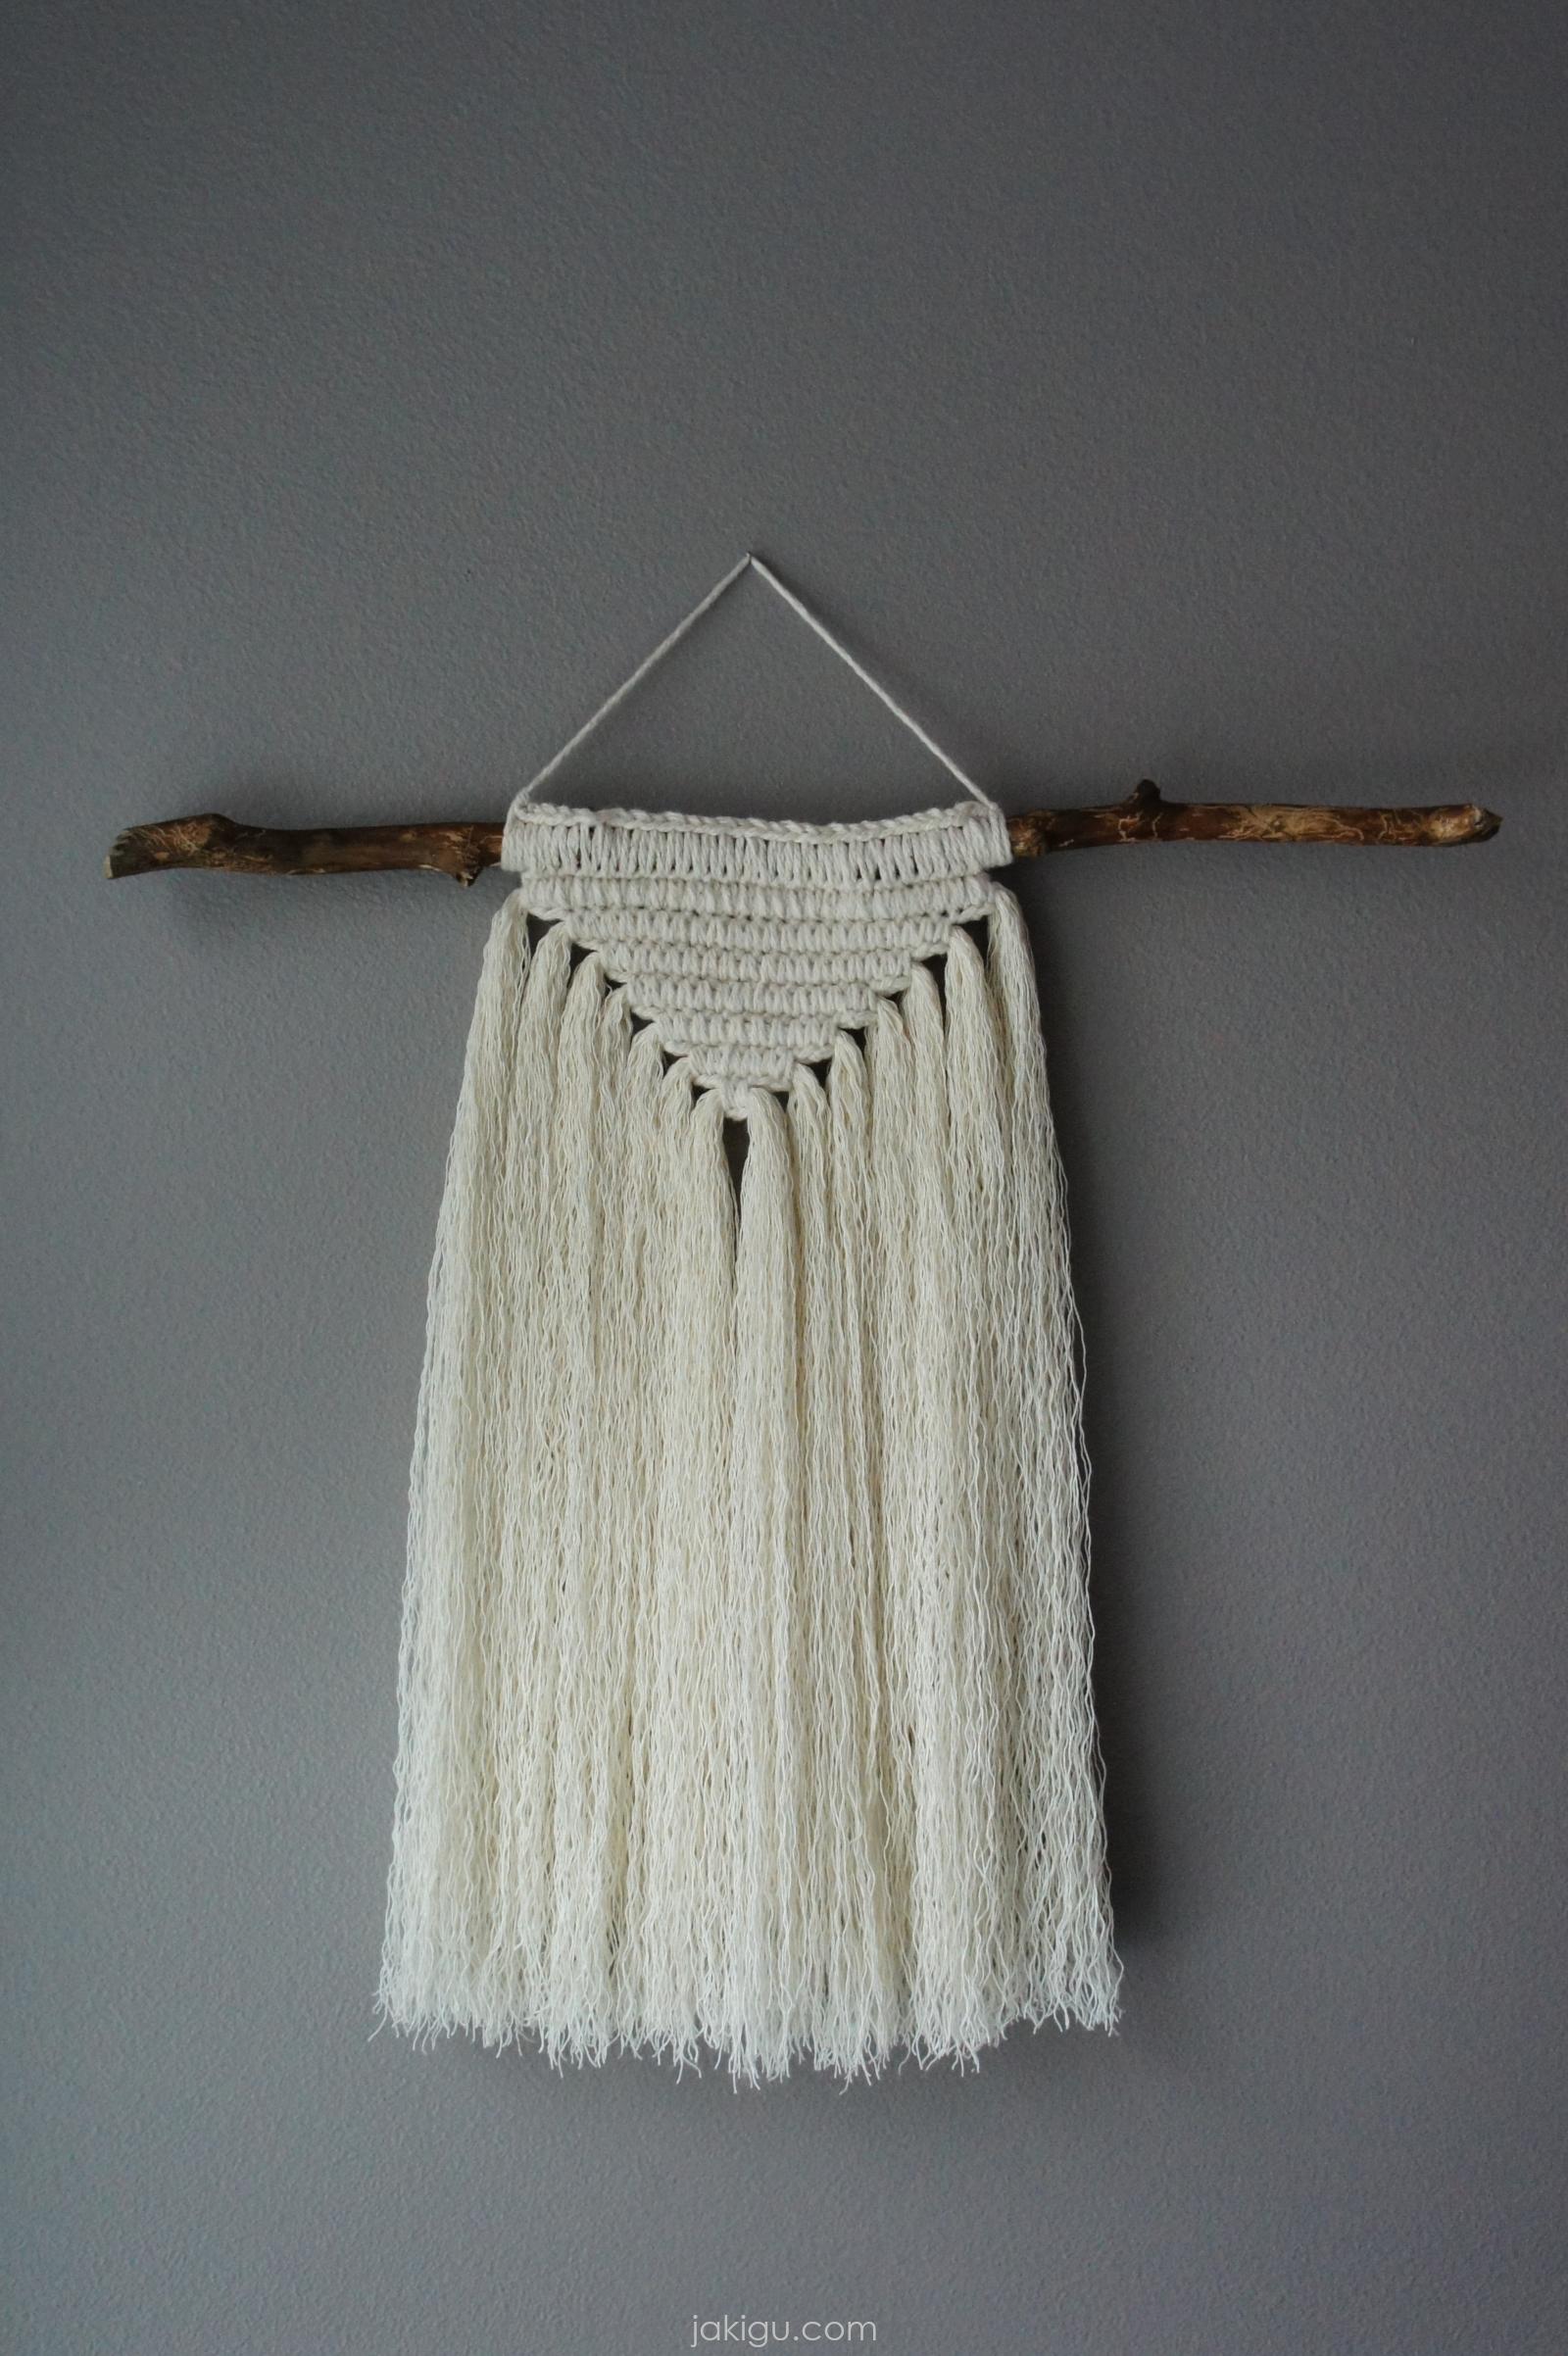 Macrachet wall hanging | jakigu.com